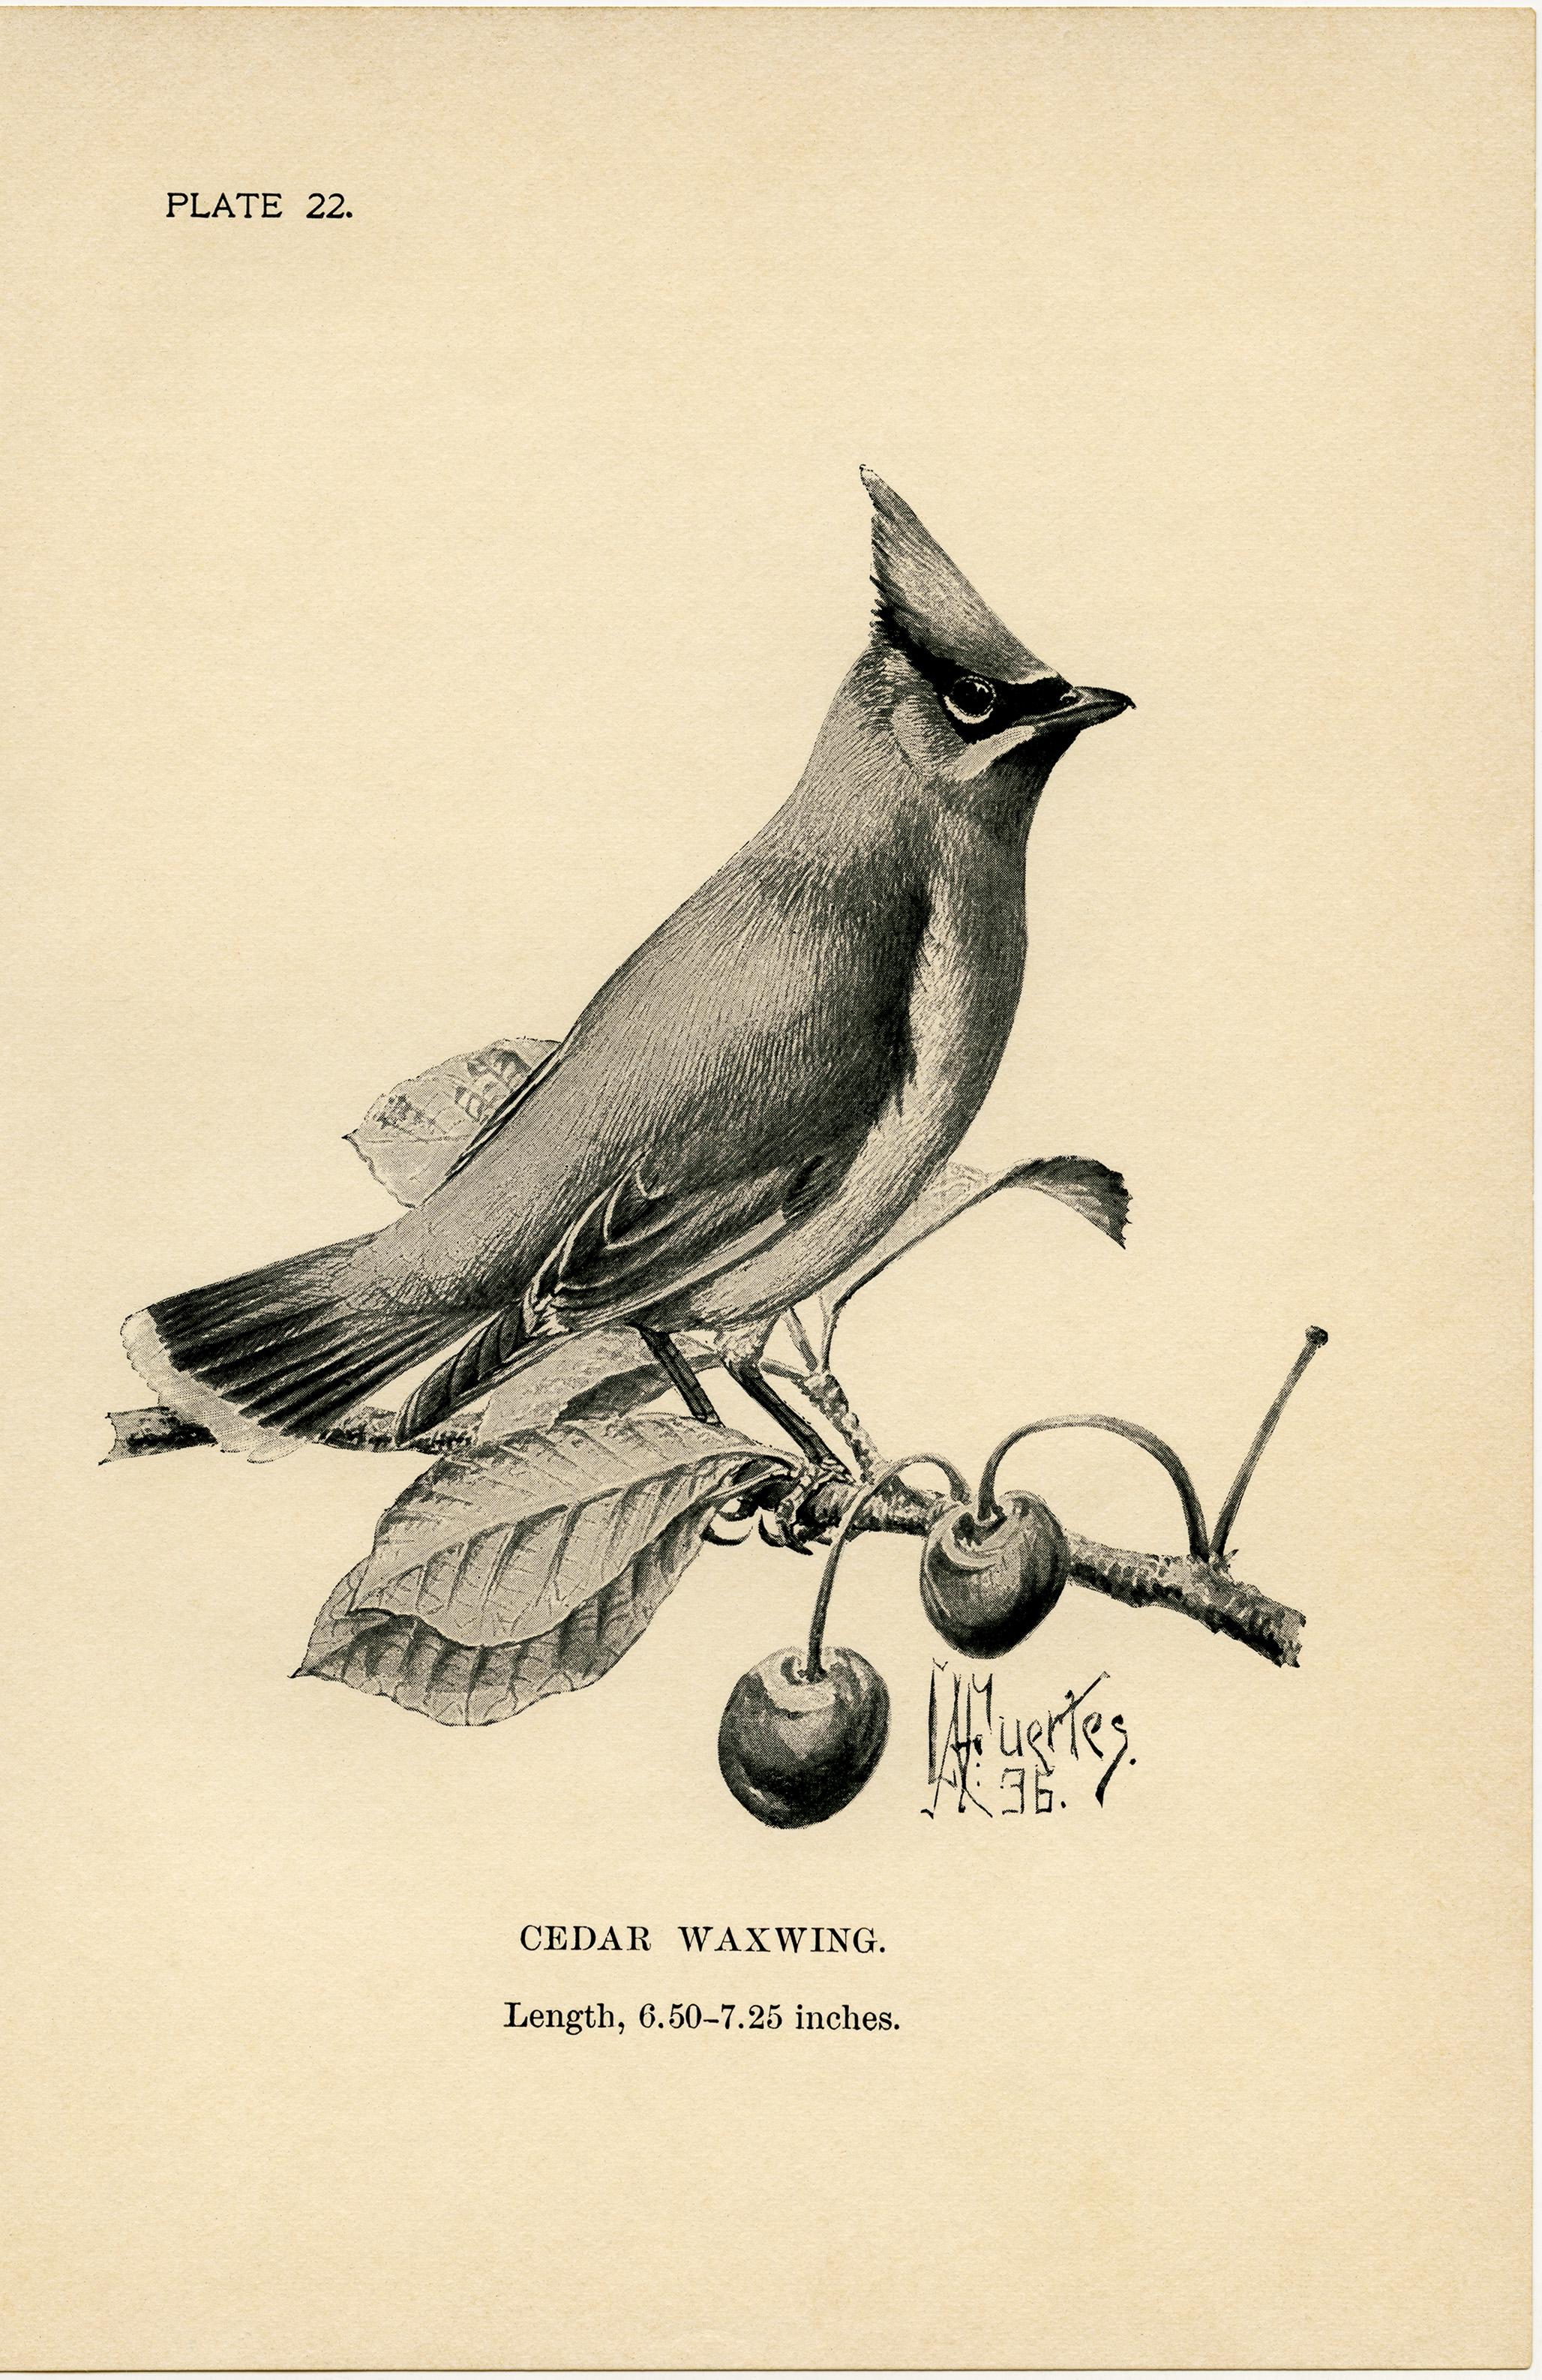 Cedar Waxwing clipart #1, Download drawings